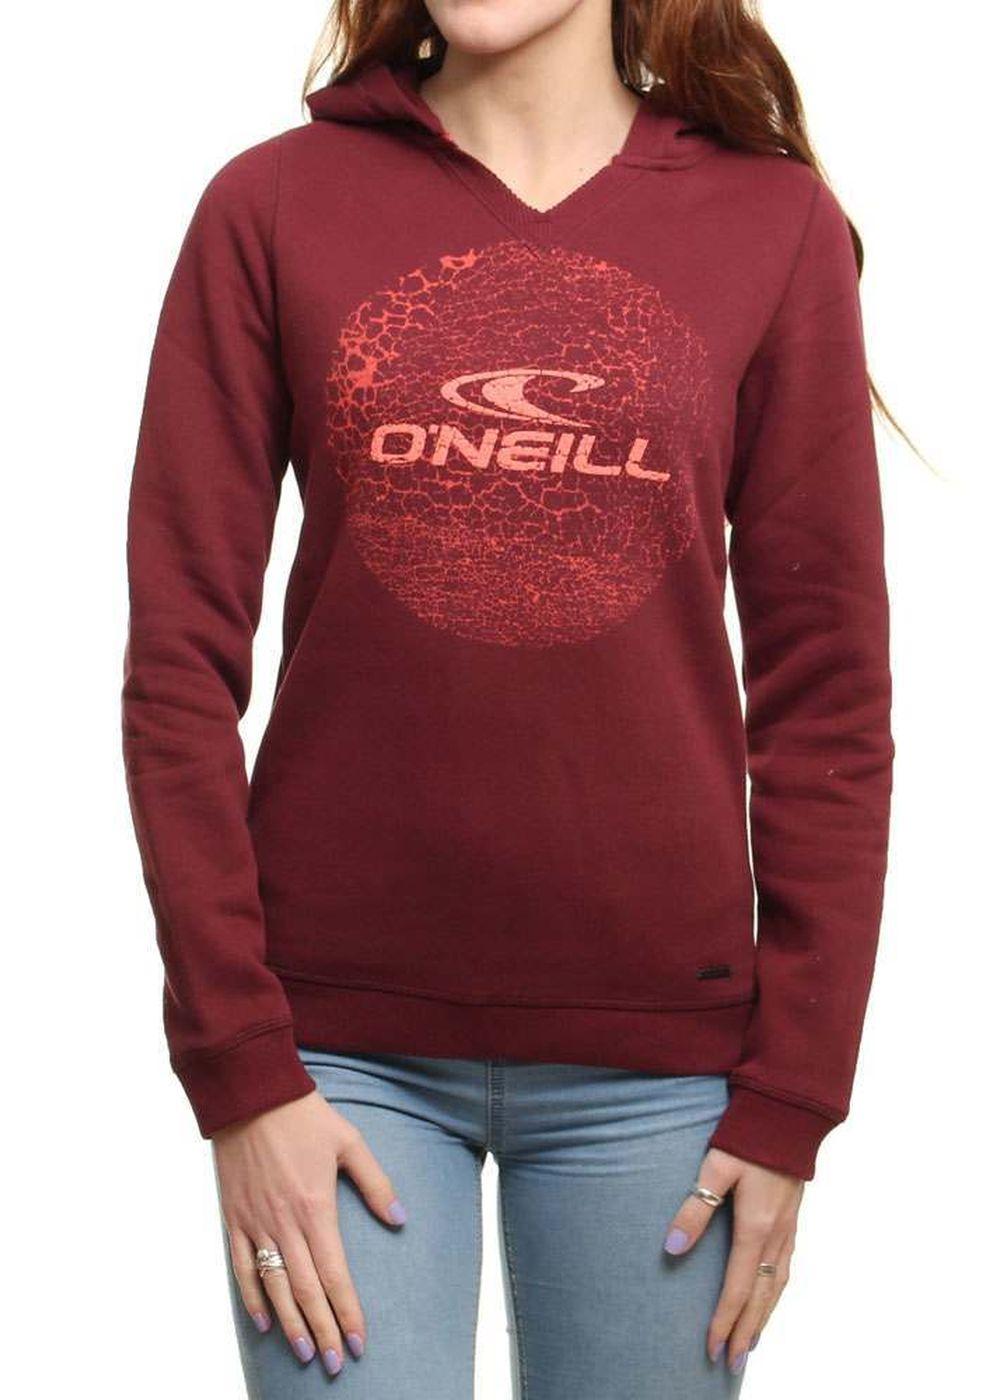 ONEILL CIRCLE LOGO HOODY Truffle Red